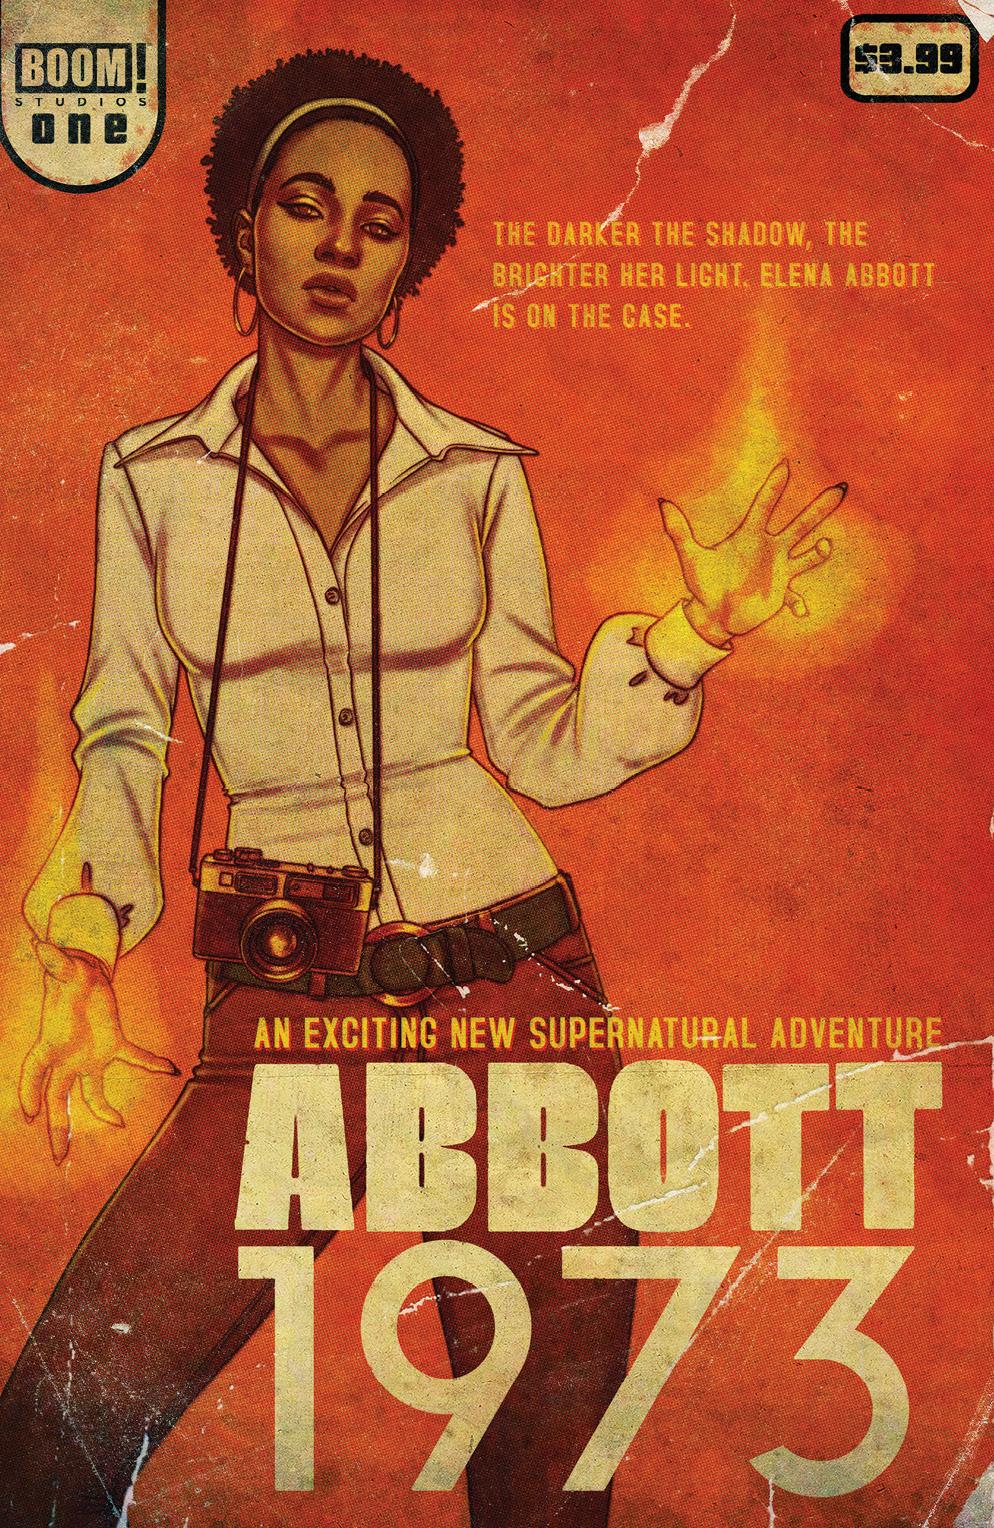 Abbott_1973_001_Cover_C ComicList: BOOM! Studios New Releases for 01/20/2021